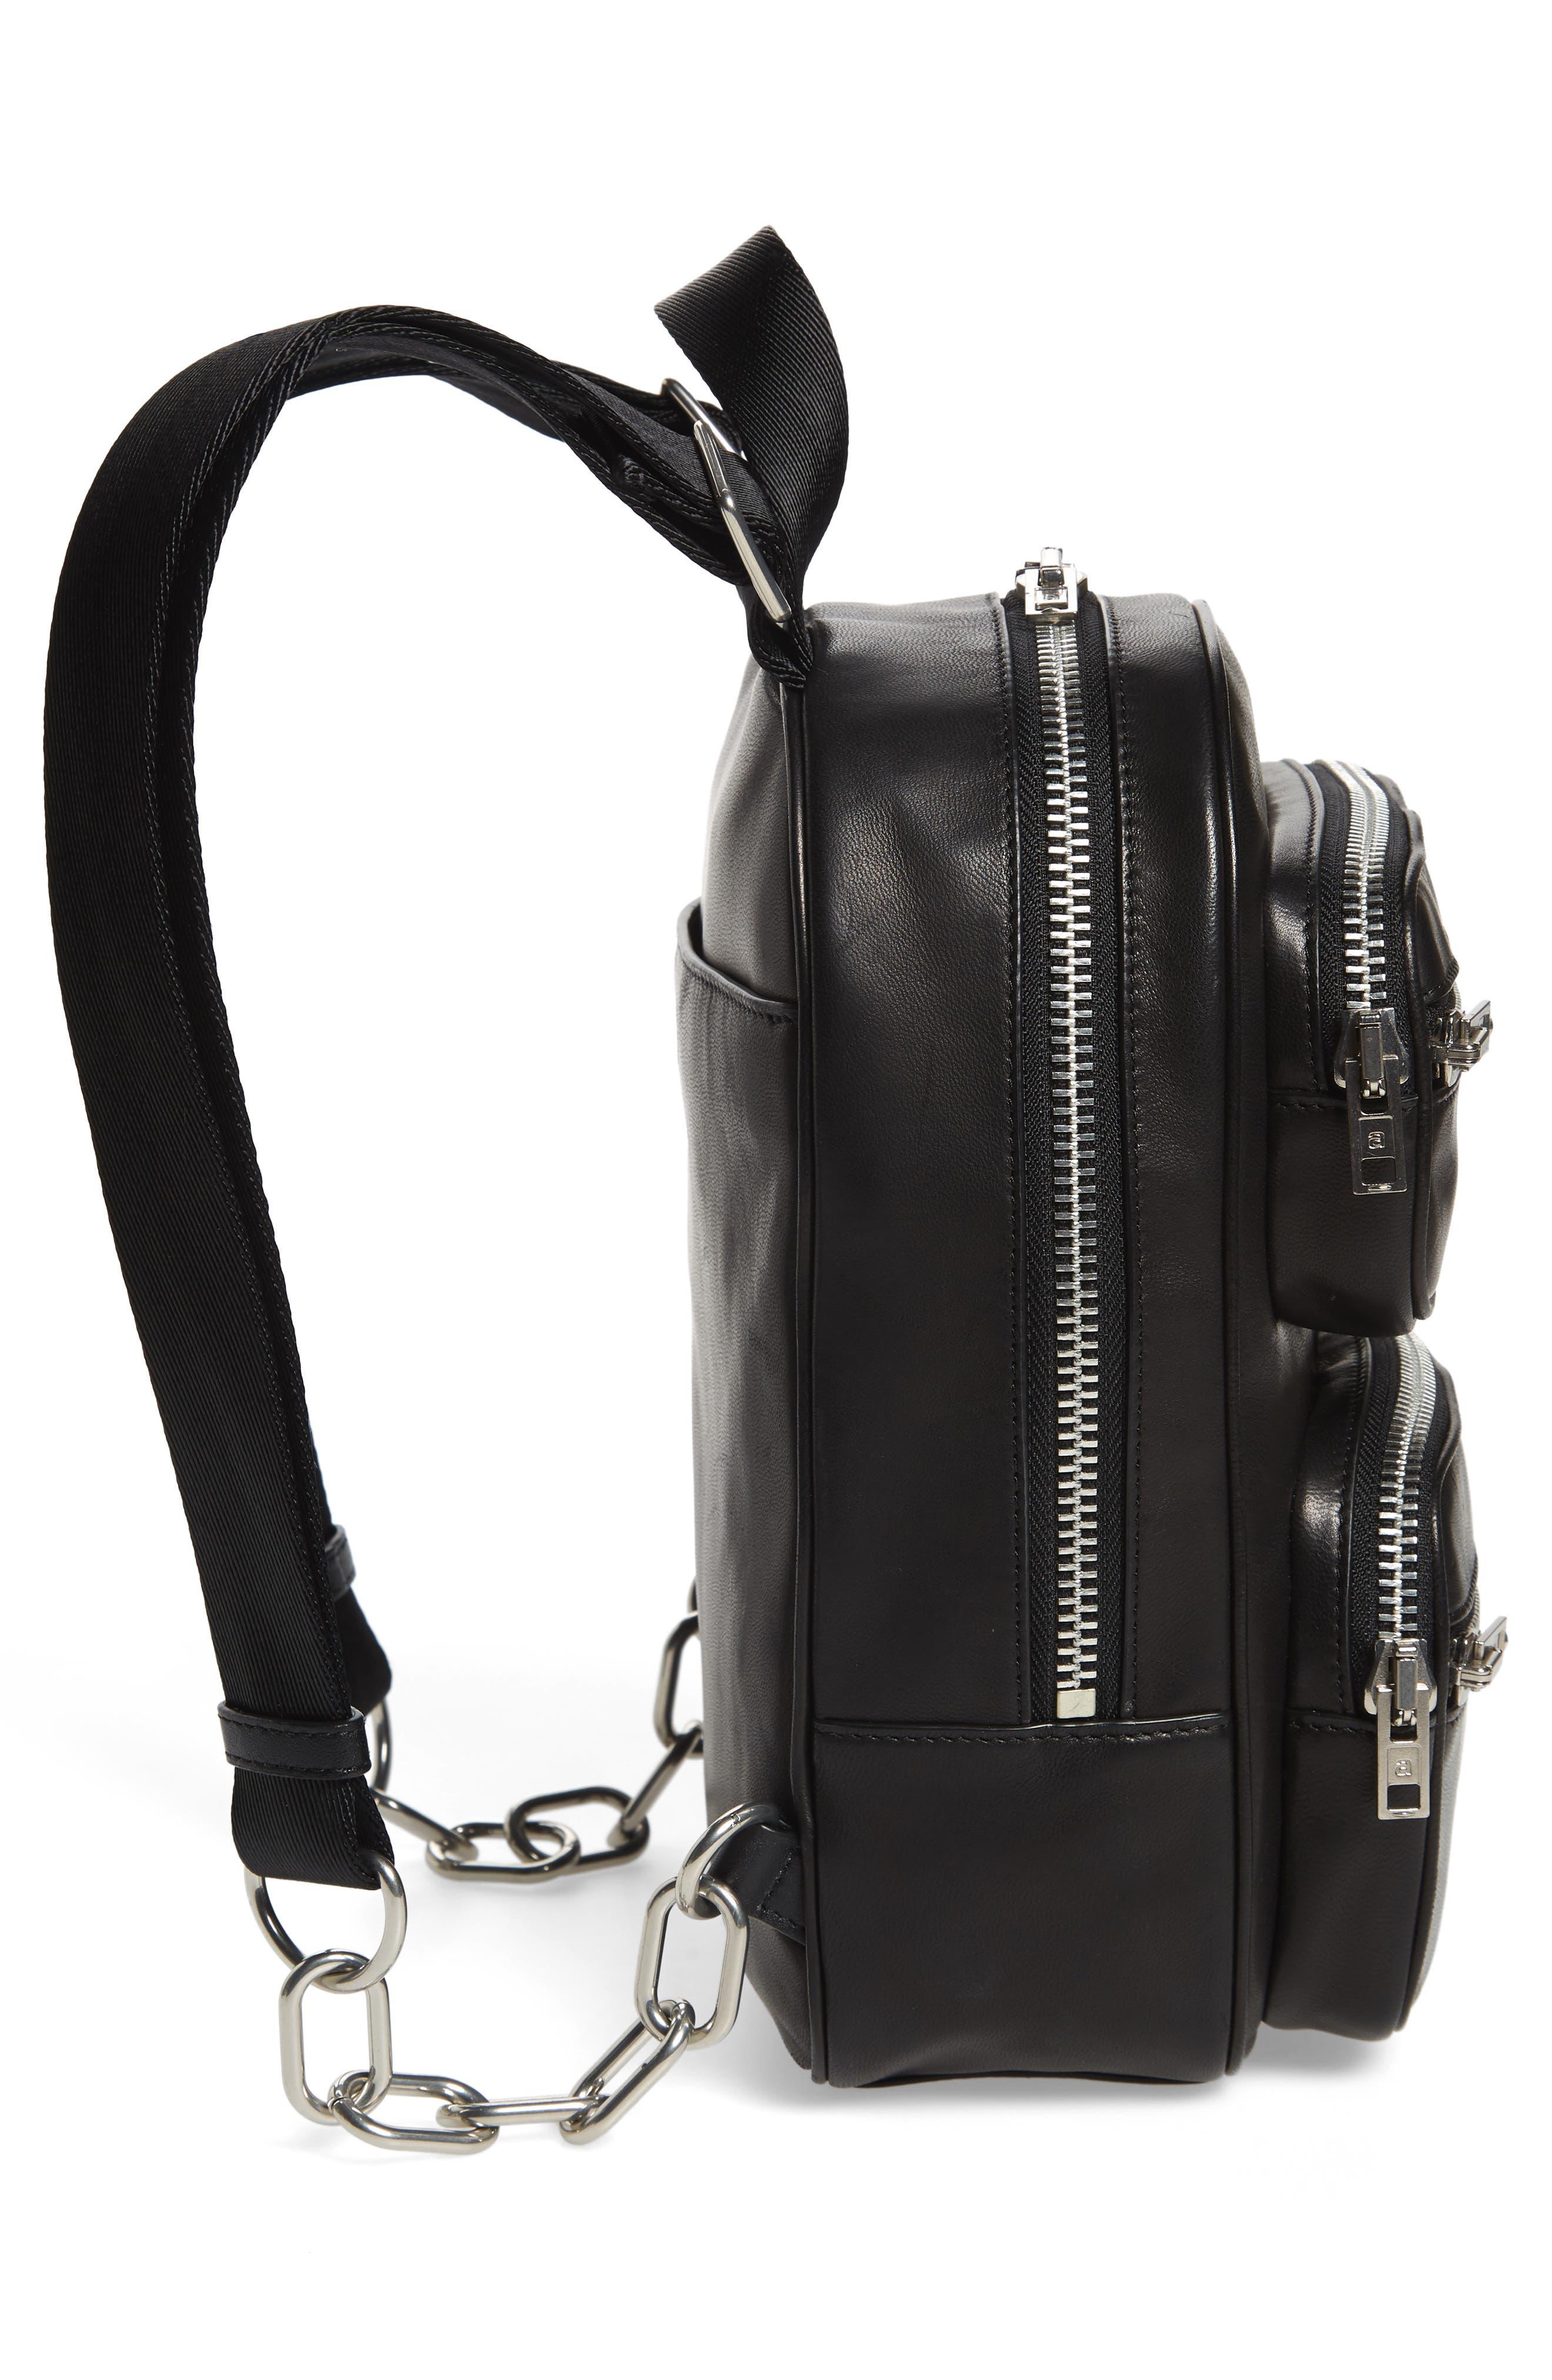 ALEXANDER WANG, Attica Lambskin Leather Backpack, Alternate thumbnail 5, color, BLACK